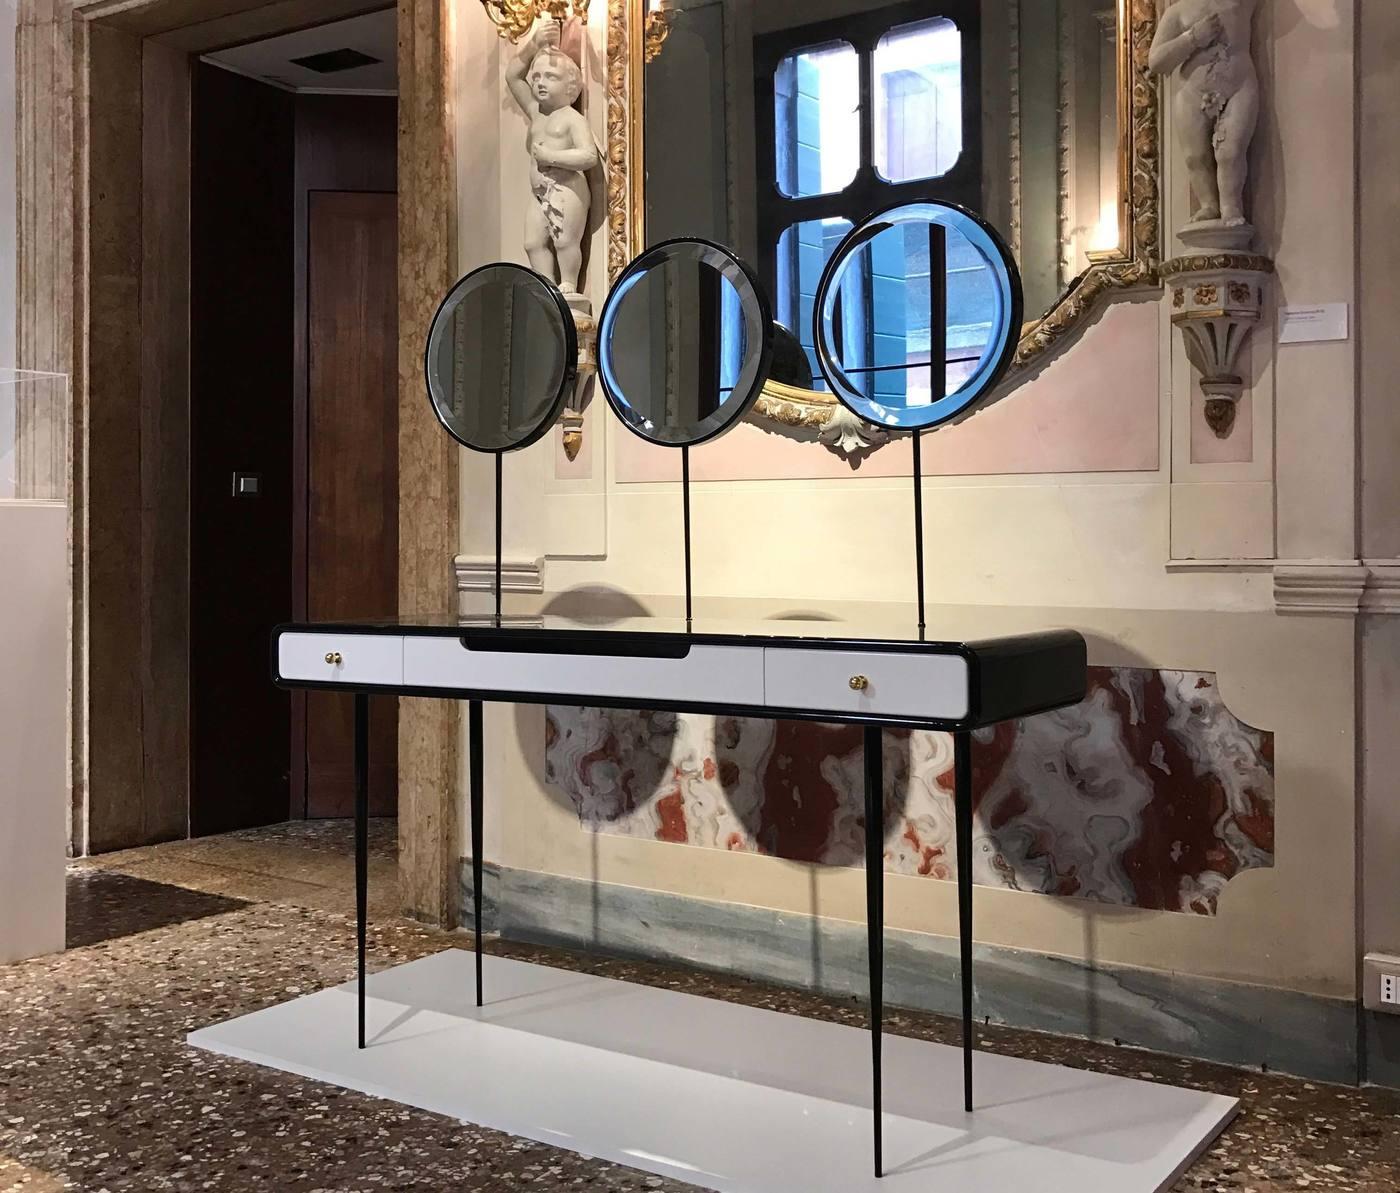 The Alien 3.0 vanity desk by Ekaterina Elizarova shot  in Venetian interiors.